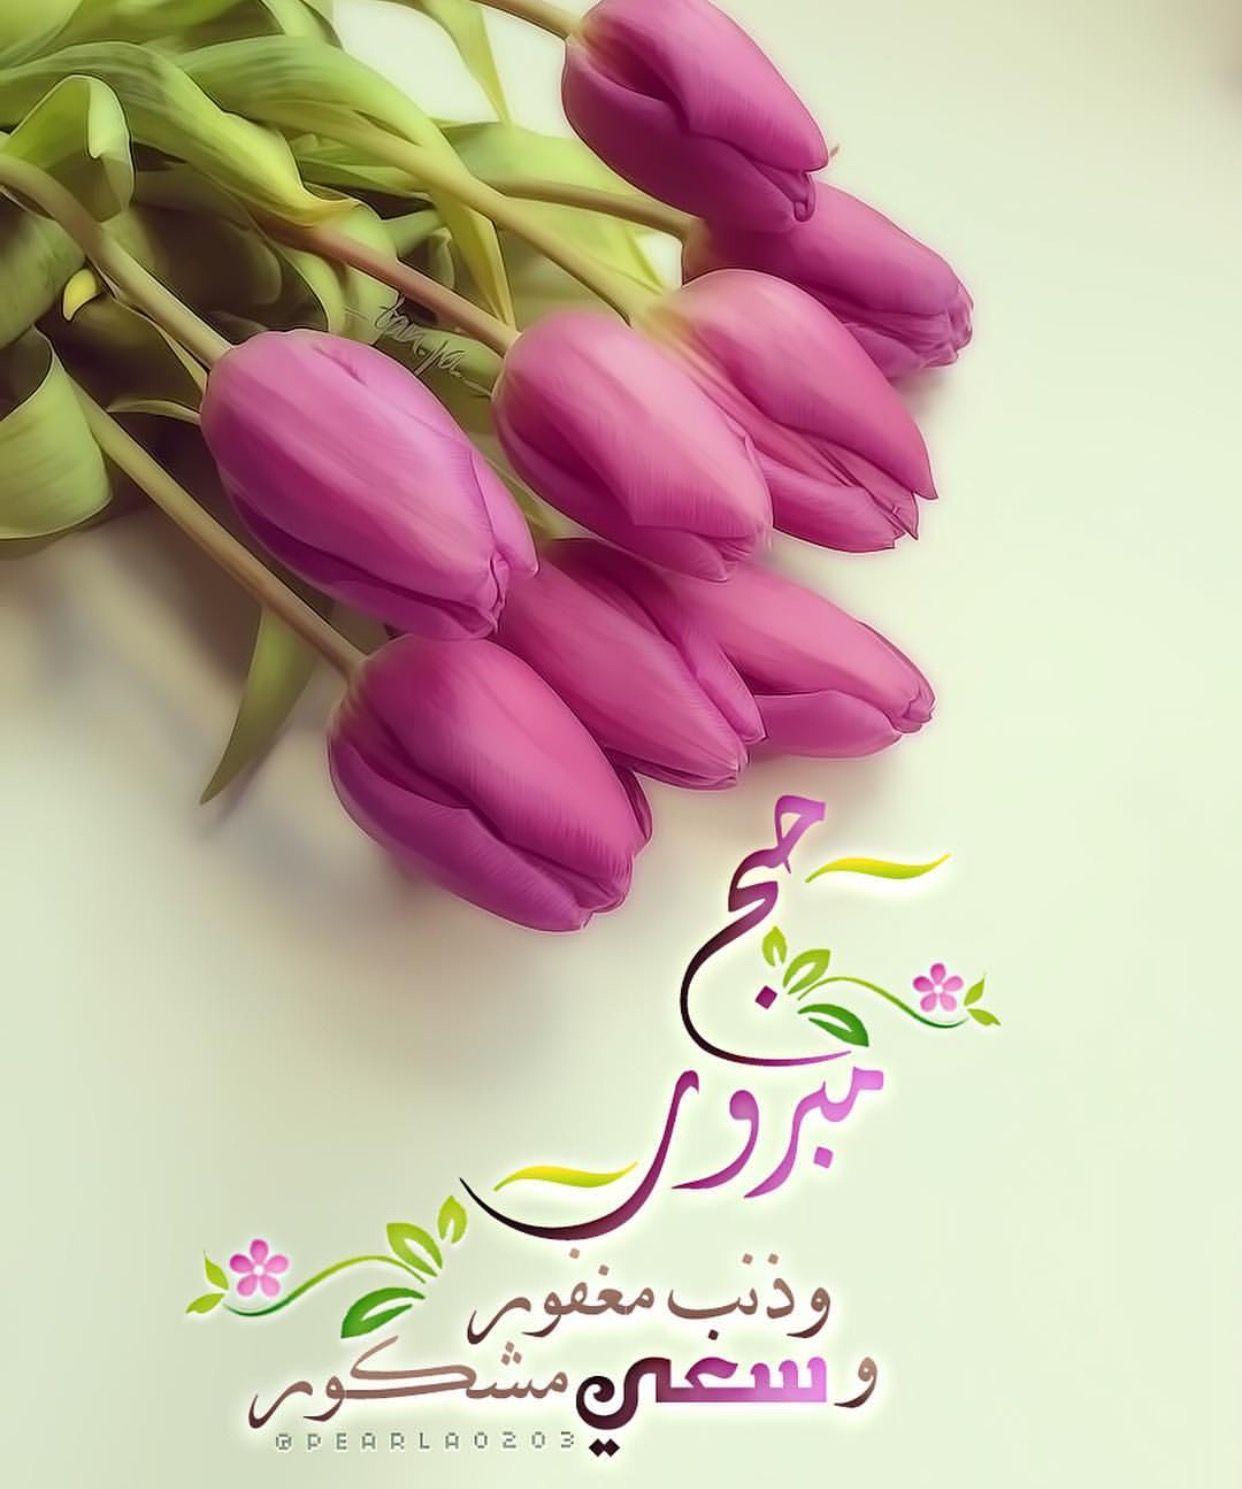 حج مبرور وسعي مشكور Ramadan Islamic Paintings Ramadan Kareem